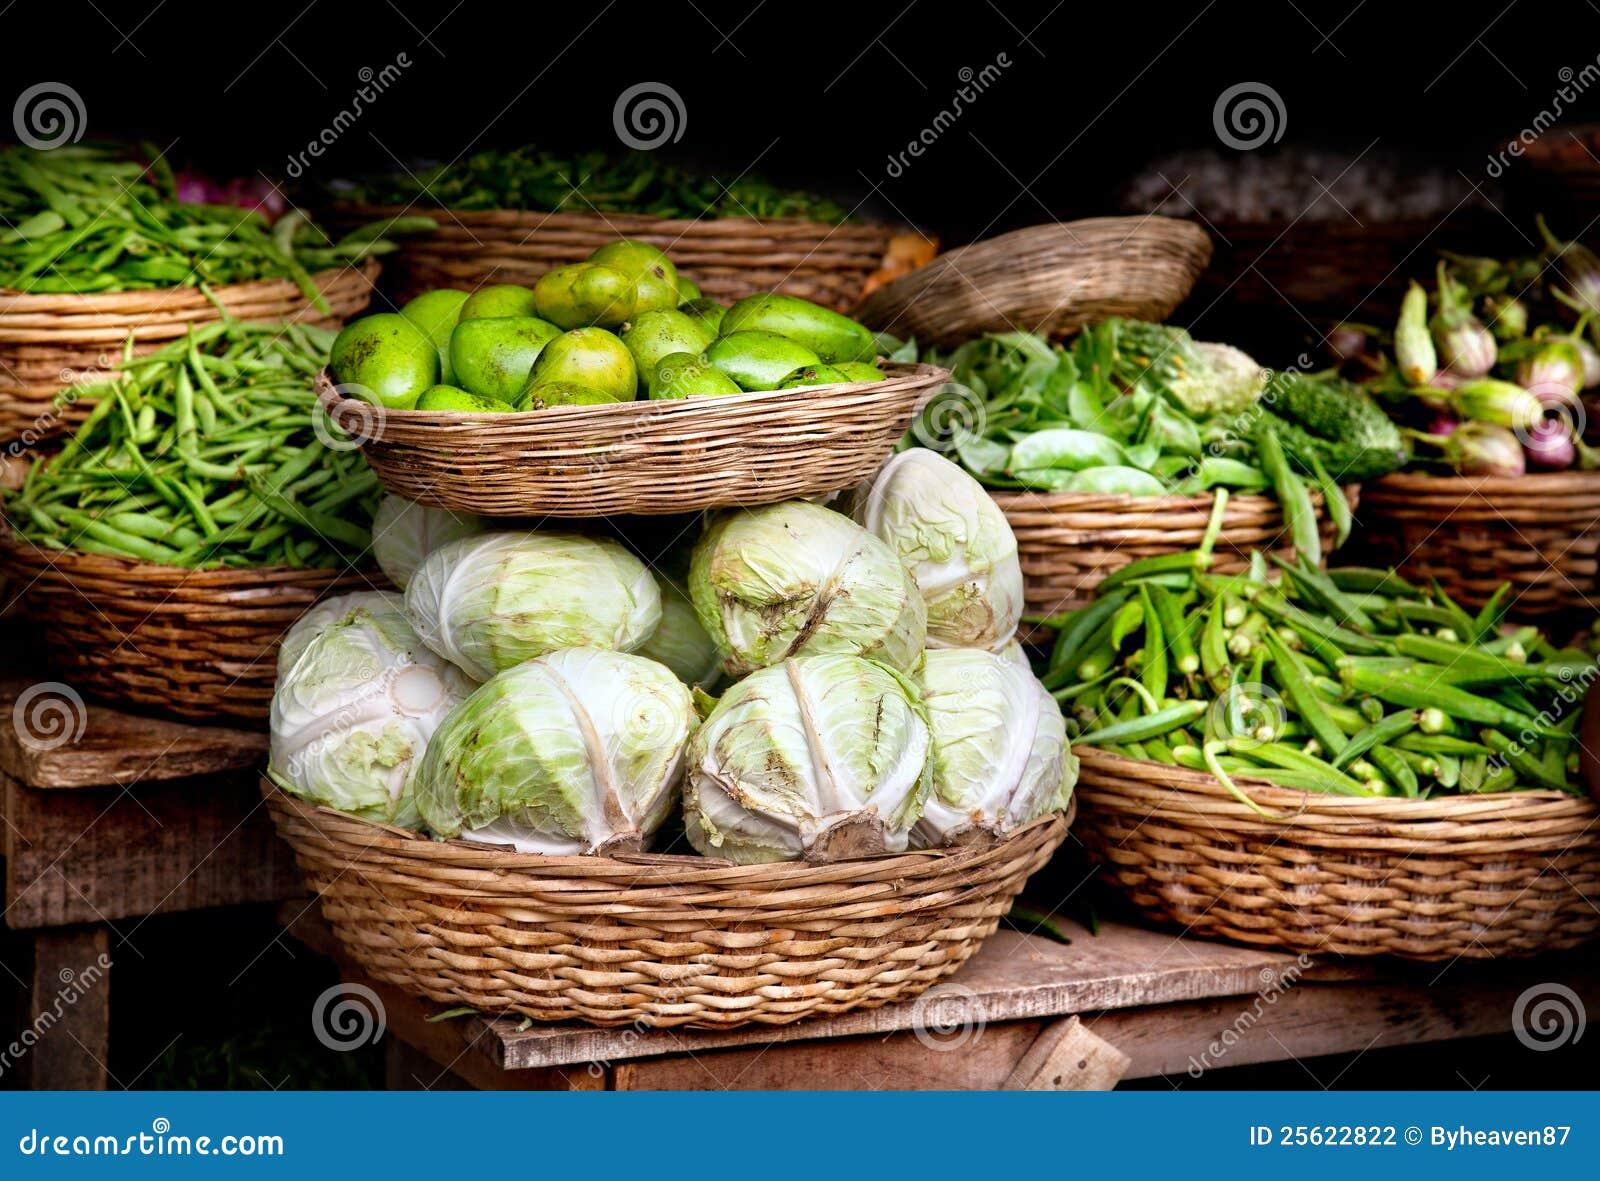 Vegetables At Indian Market Stock Photography - Image ...Kerala Vegetable Market